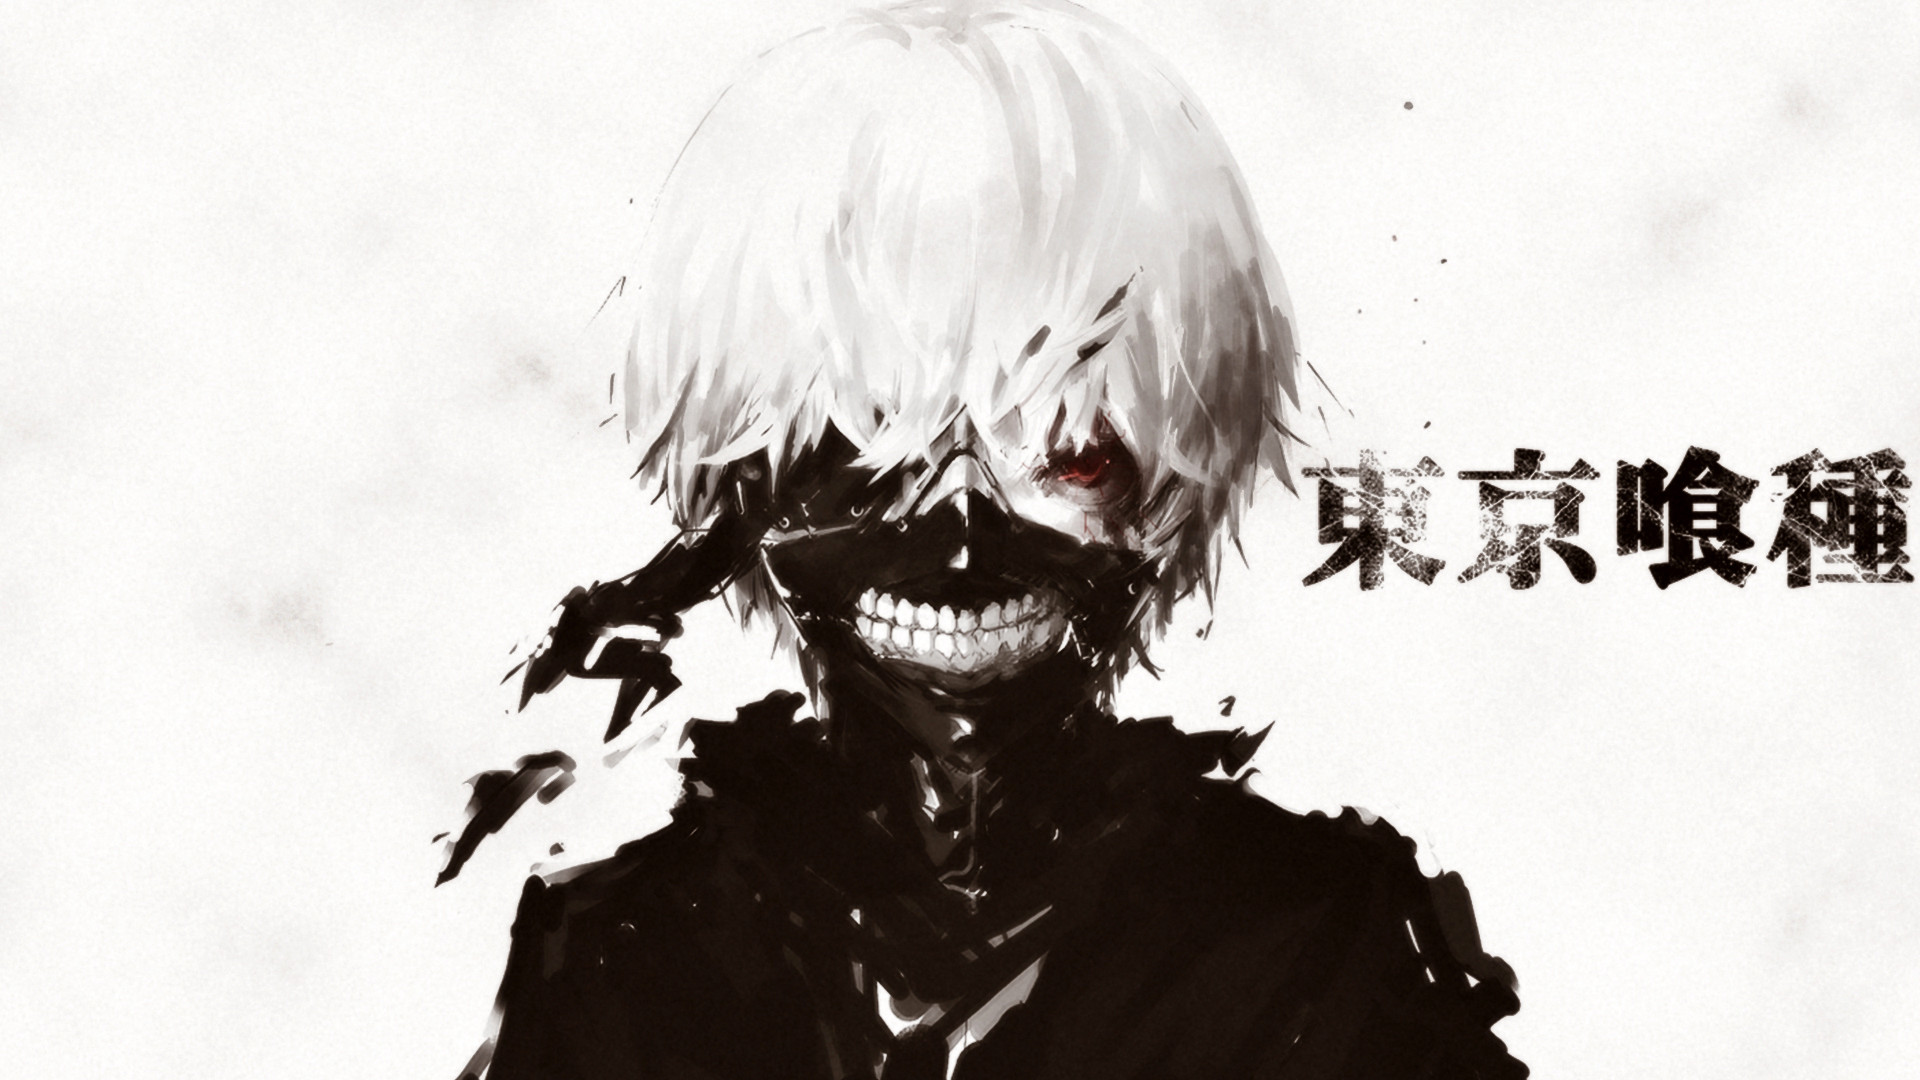 HD Wallpaper | Hintergrund ID:526888. Anime Tokyo Ghoul